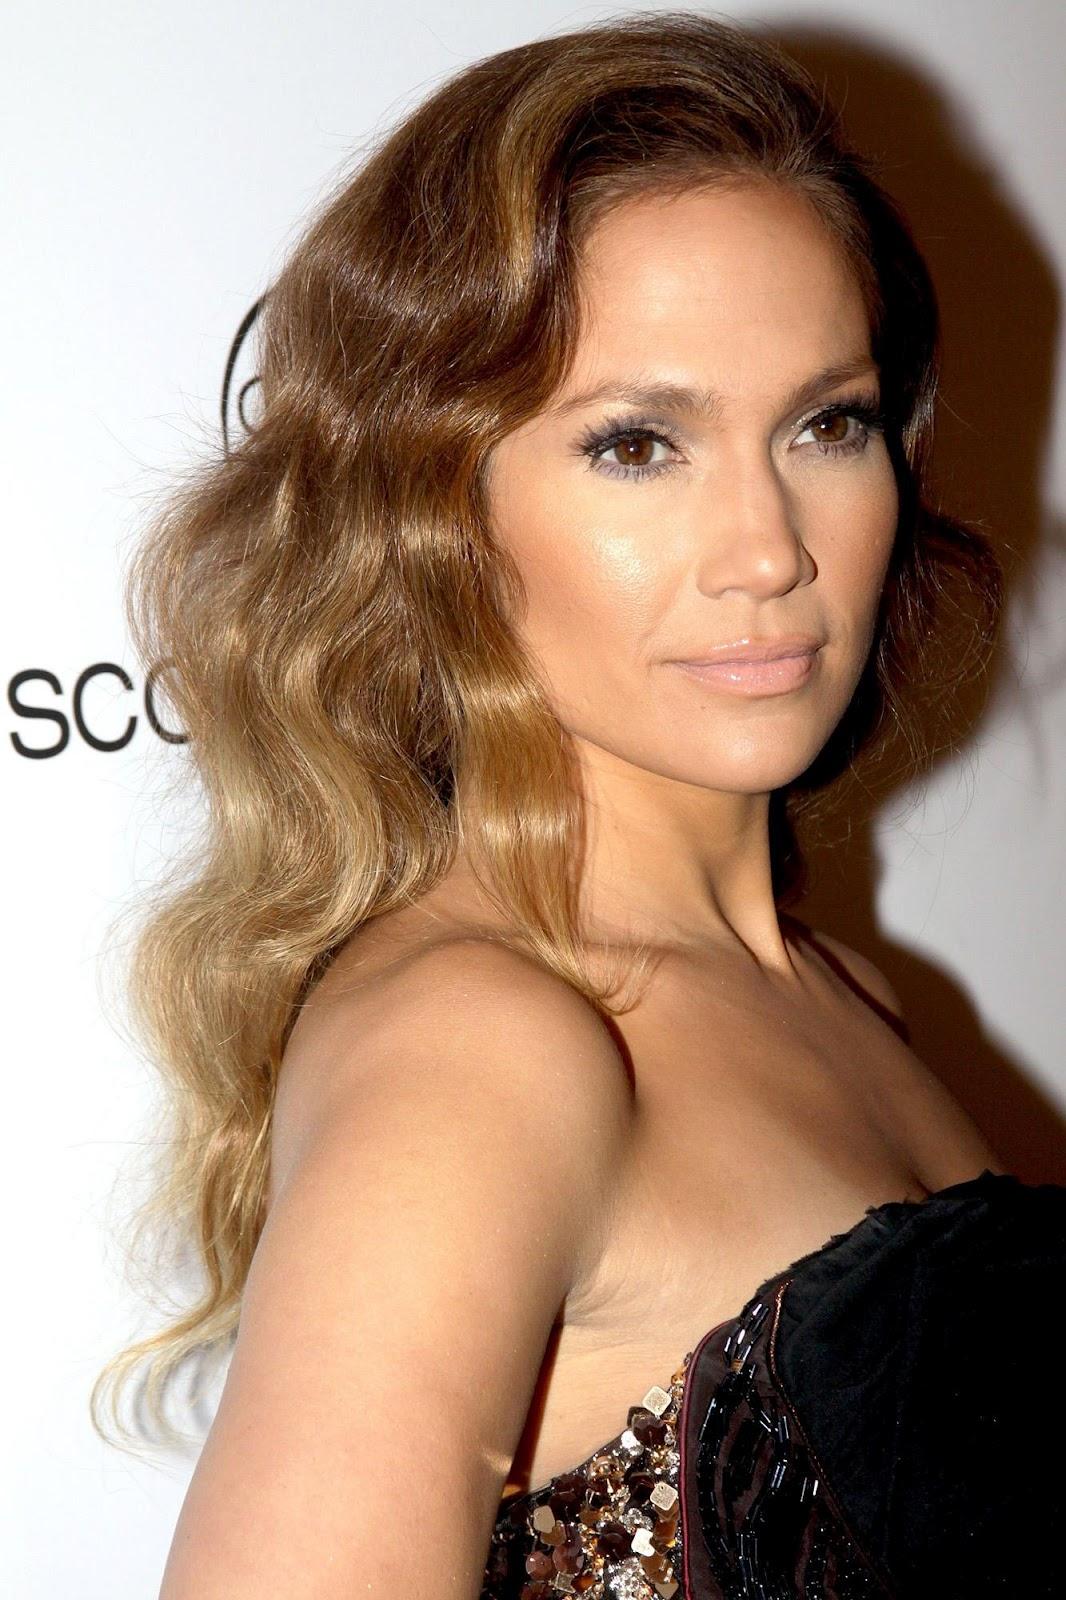 http://2.bp.blogspot.com/-CCR2g_hwsdc/T9FVpZyo63I/AAAAAAAAA4w/7TmBDBUjLYA/s1600/Jennifer+Lopez+Pictures+12.jpg